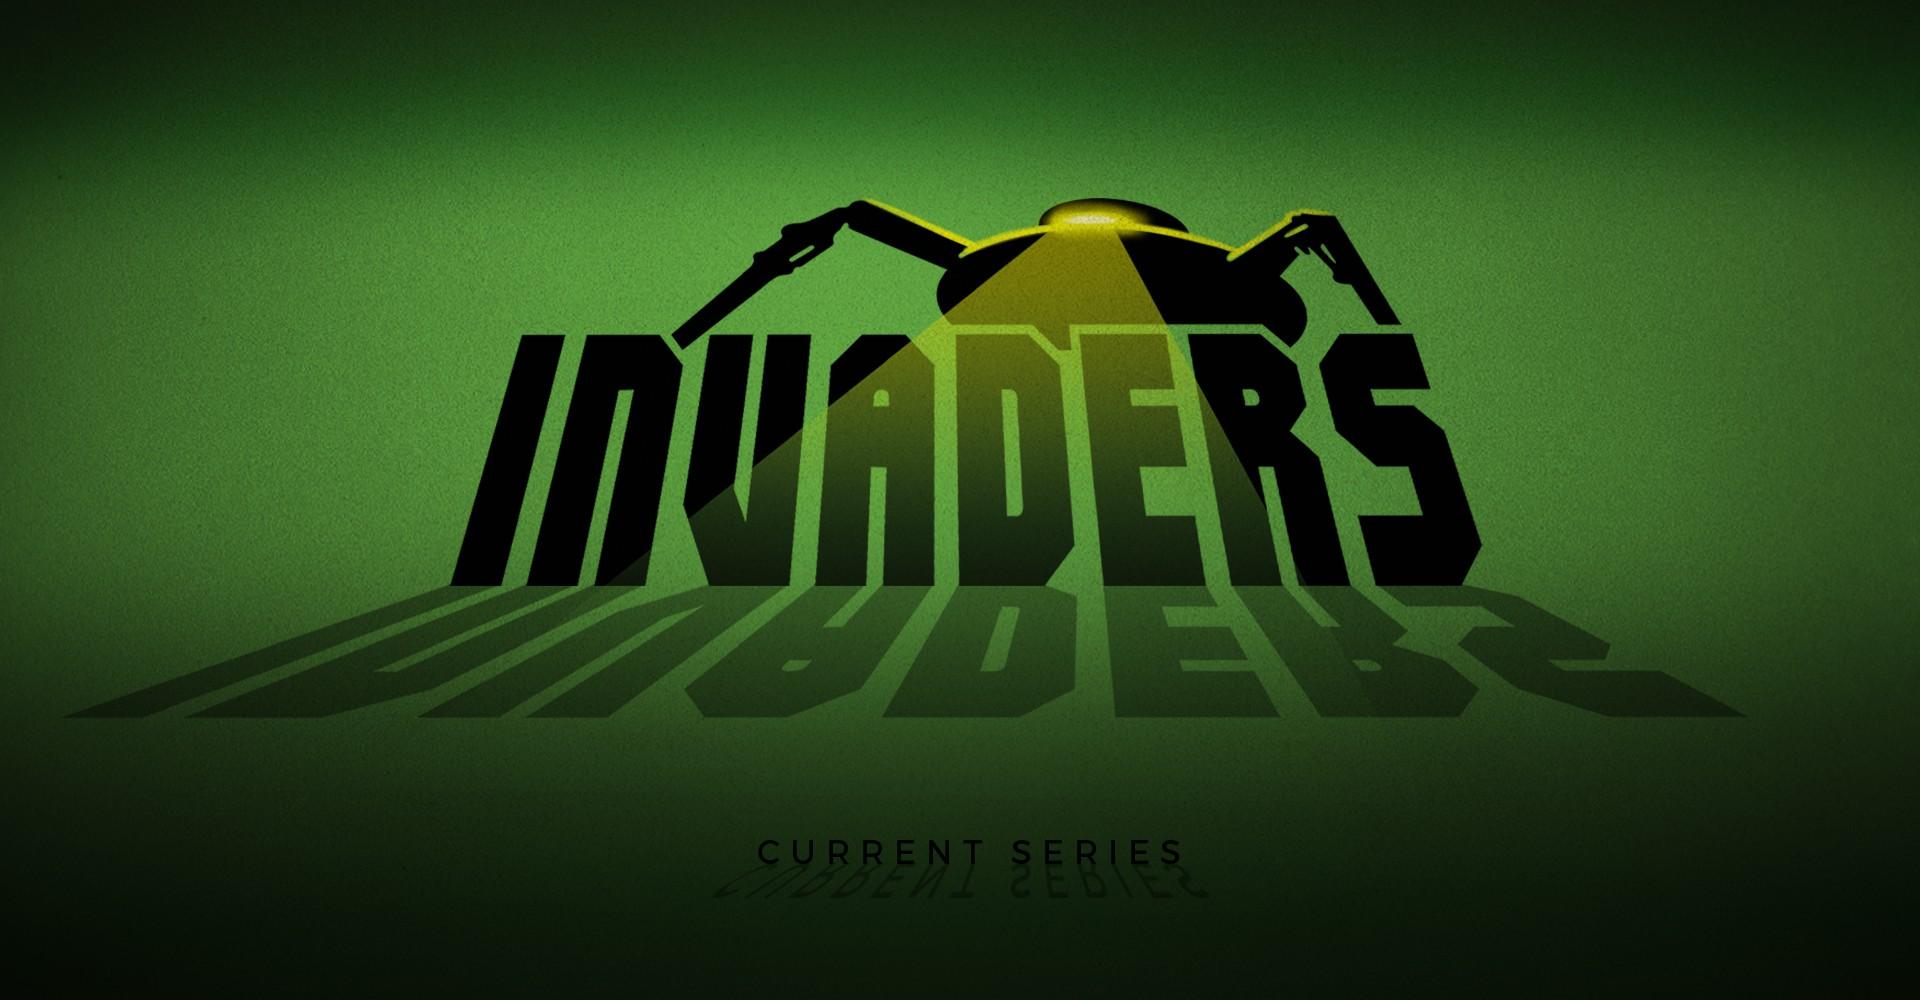 InvadersSeries-WebsiteSlider-CurrentSeries